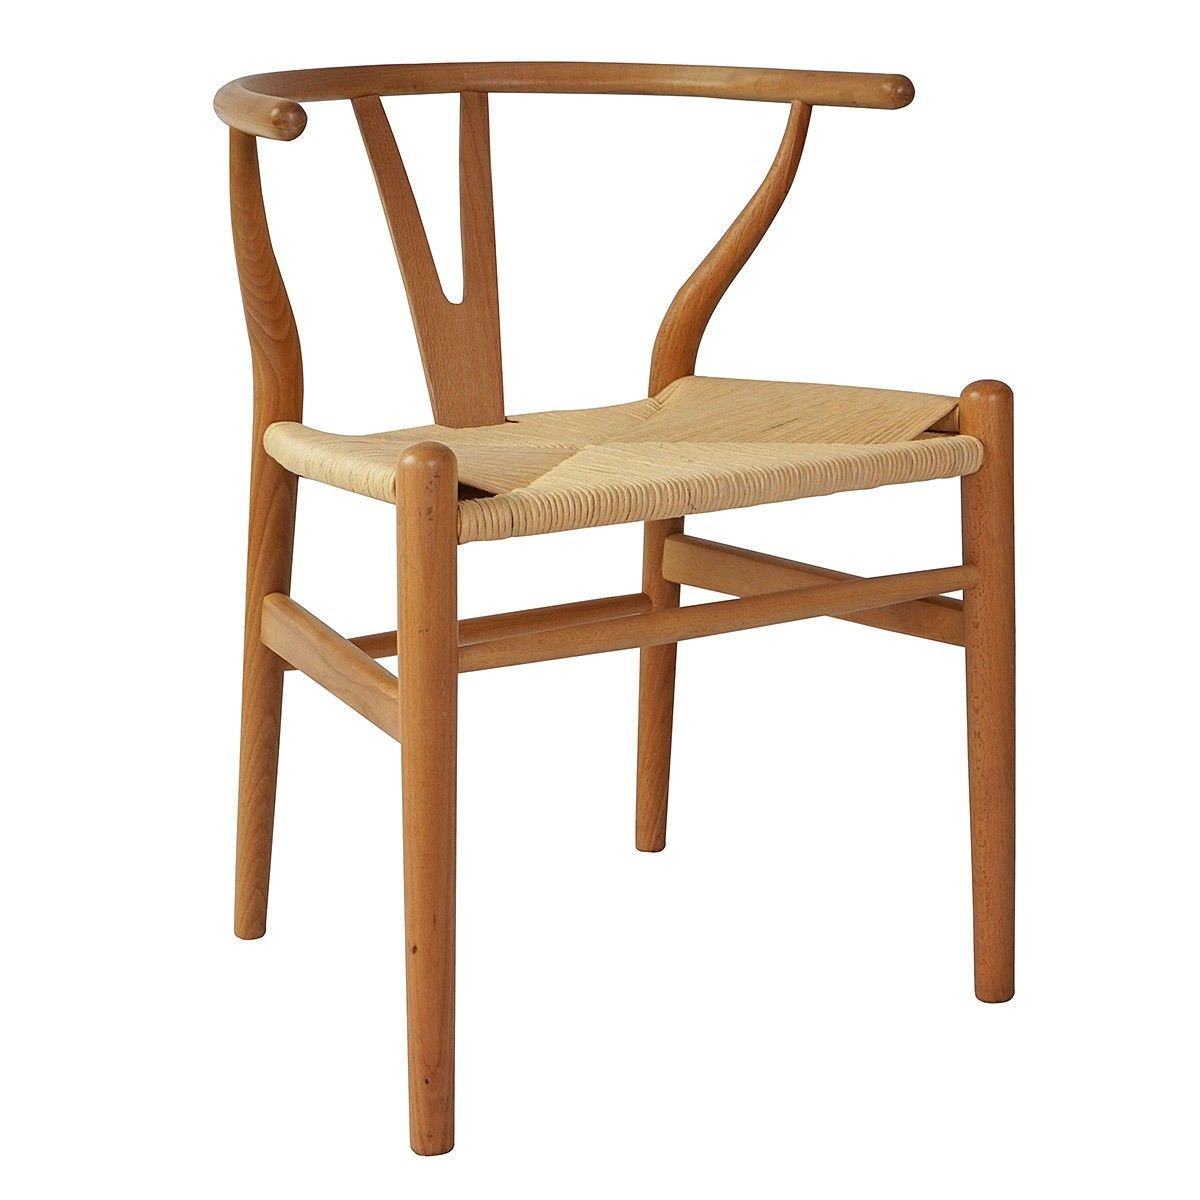 Replica Hans Wegner Wishbone Chair with Rope Seat, Natural